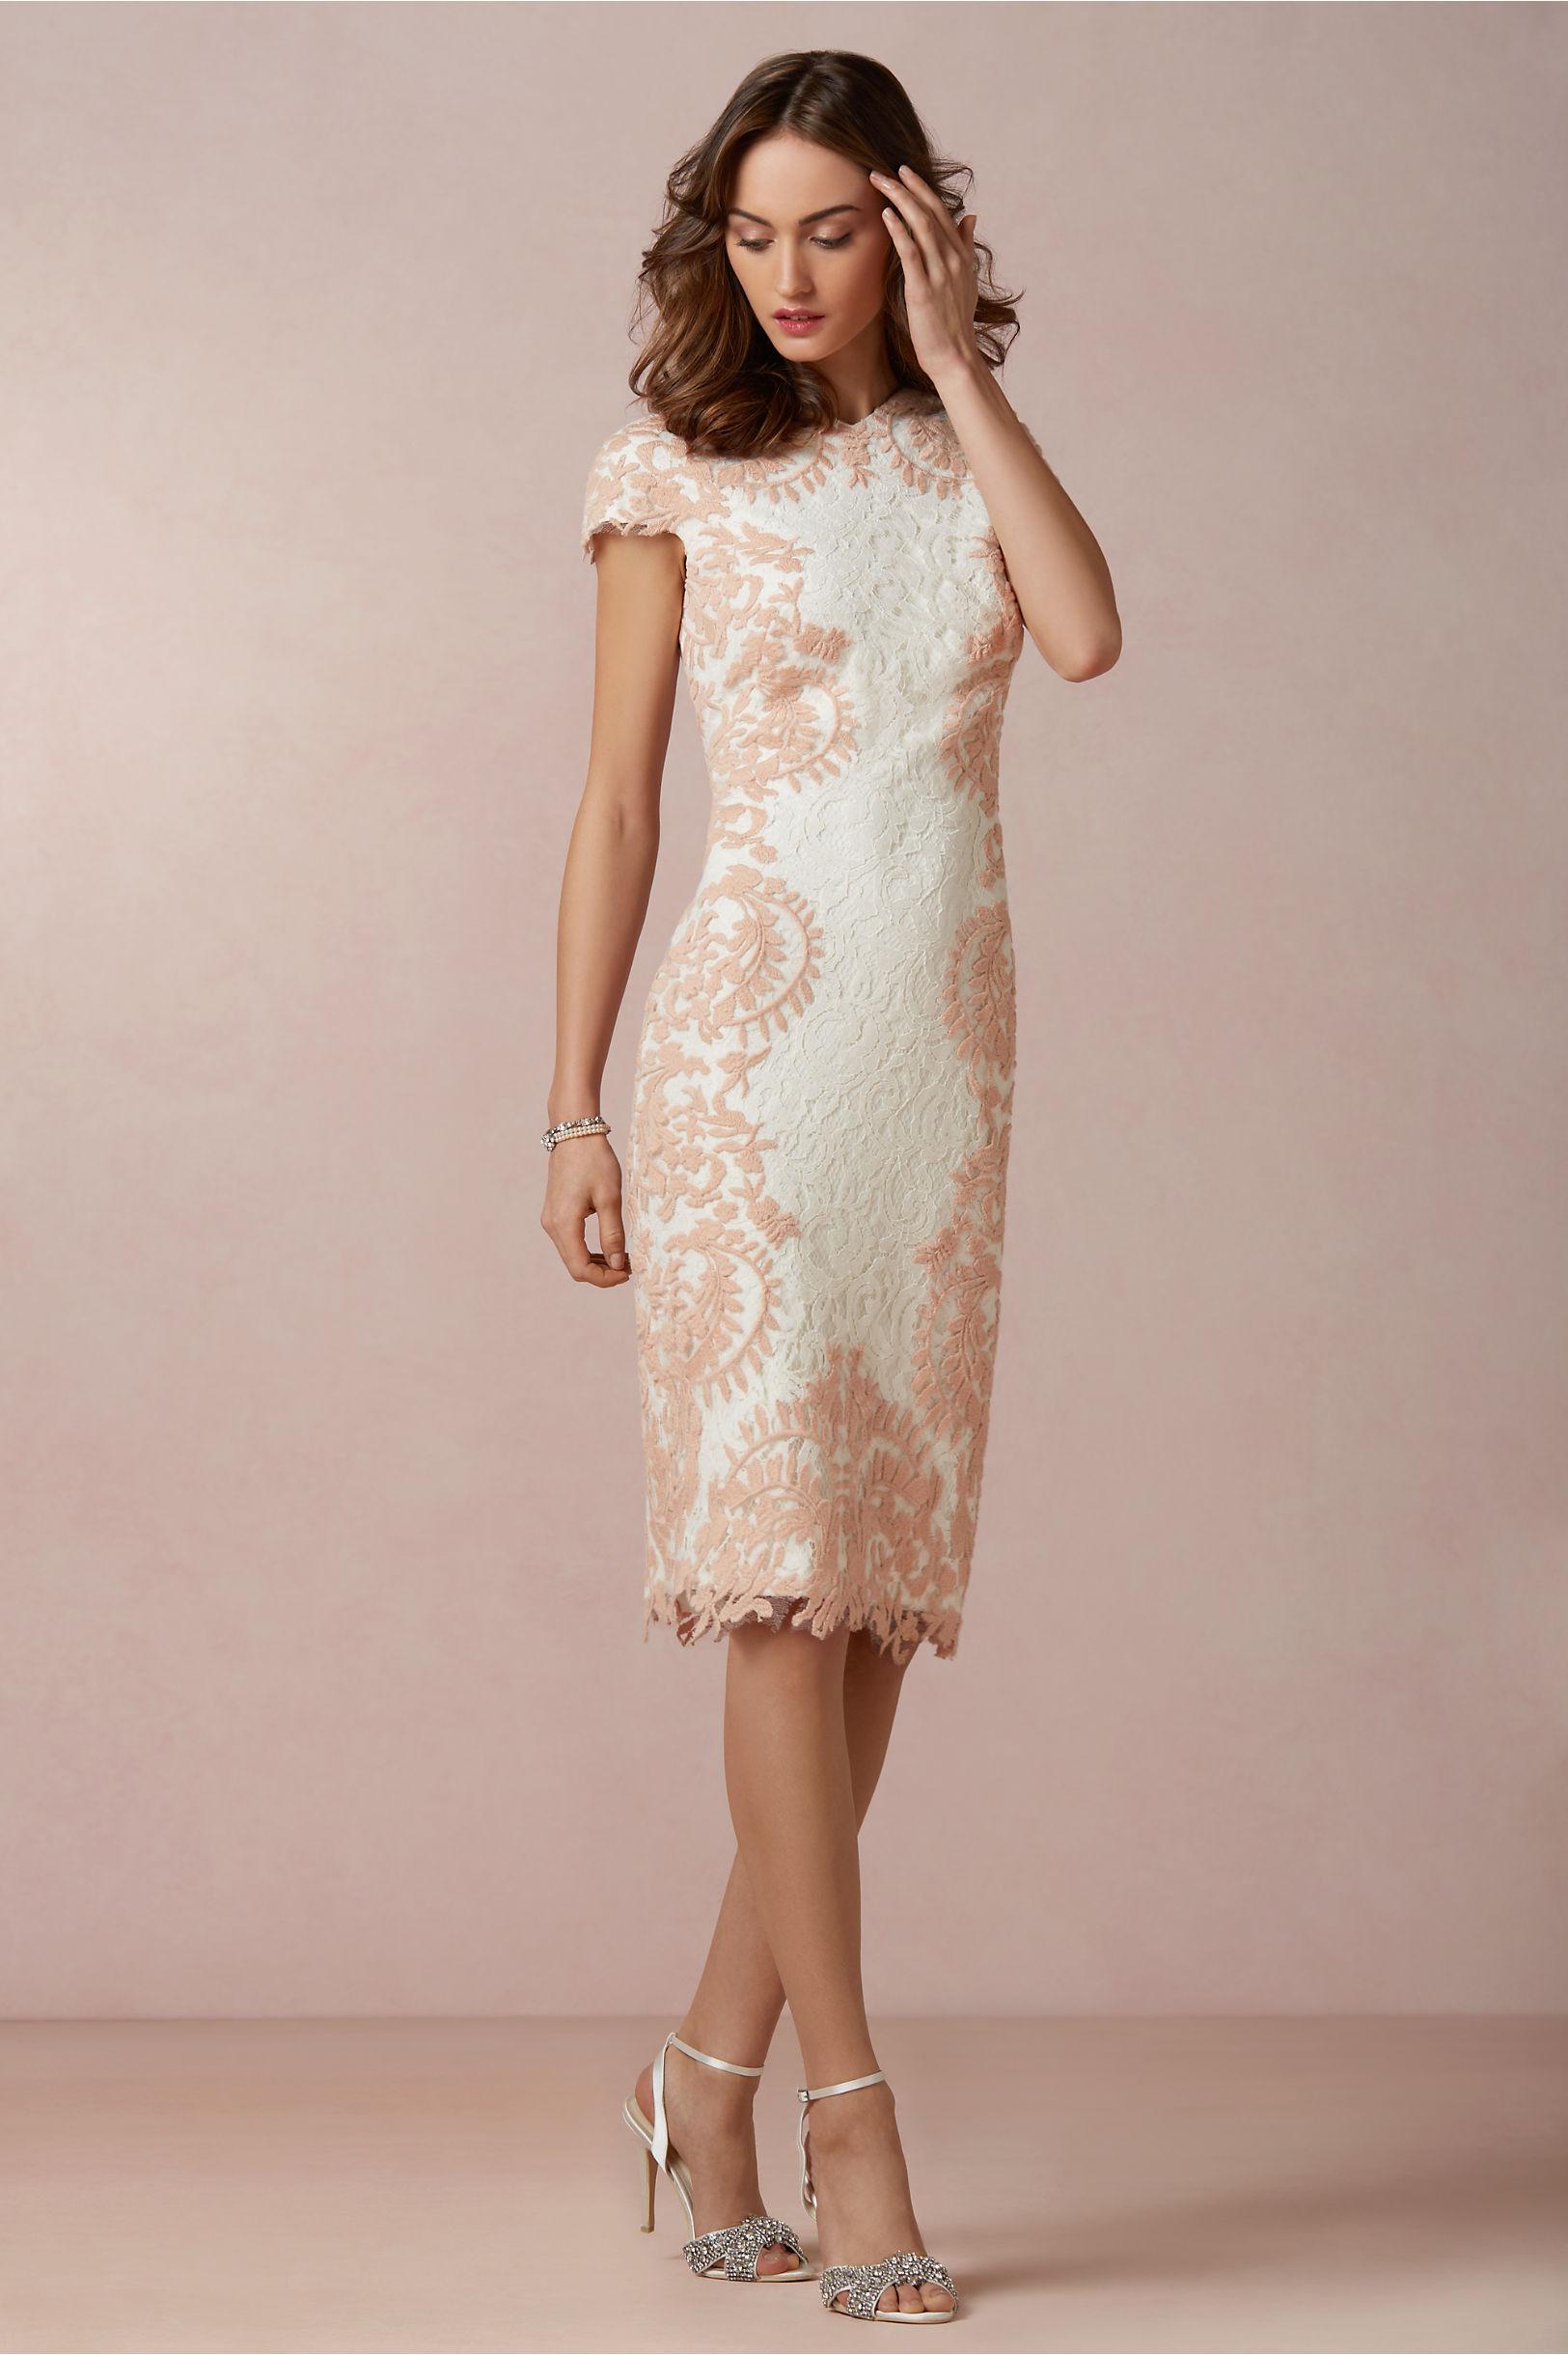 tadashi shoji dresses on sale – fashion dresses